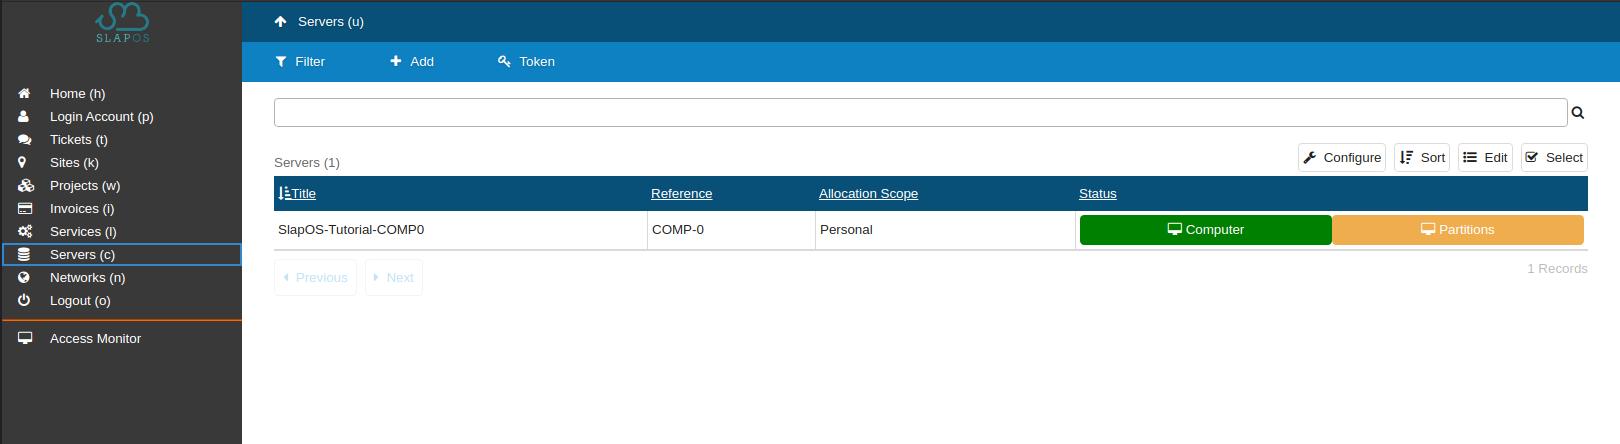 SlapOS - Server List